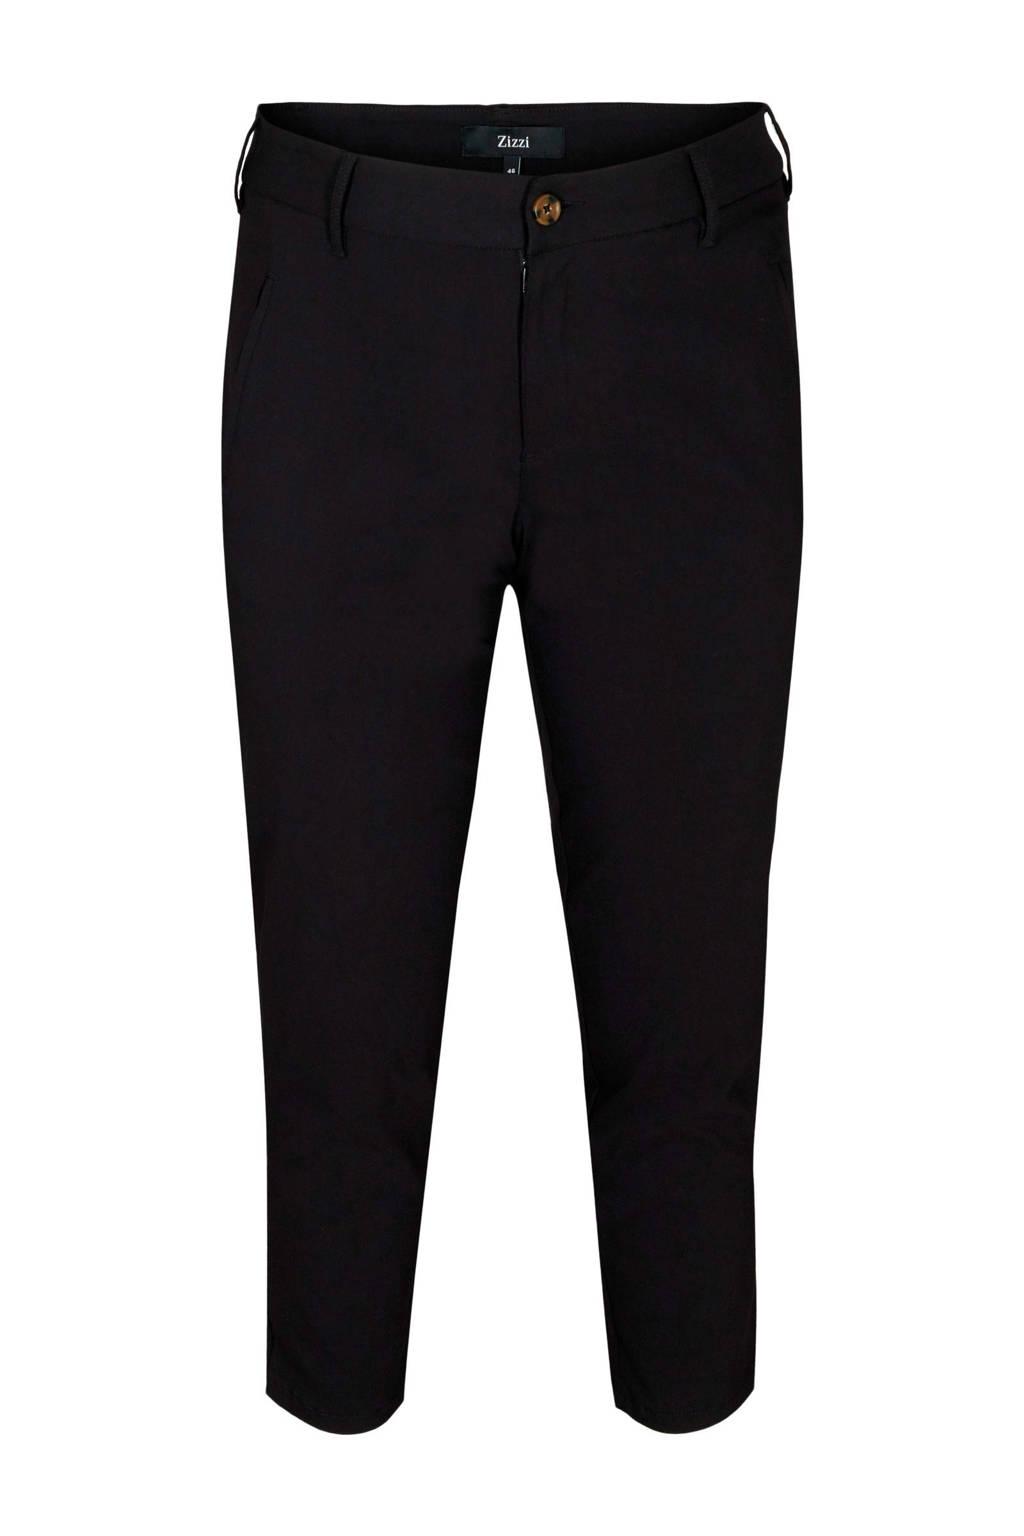 Zizzi cropped skinny broek Bella zwart, Zwart